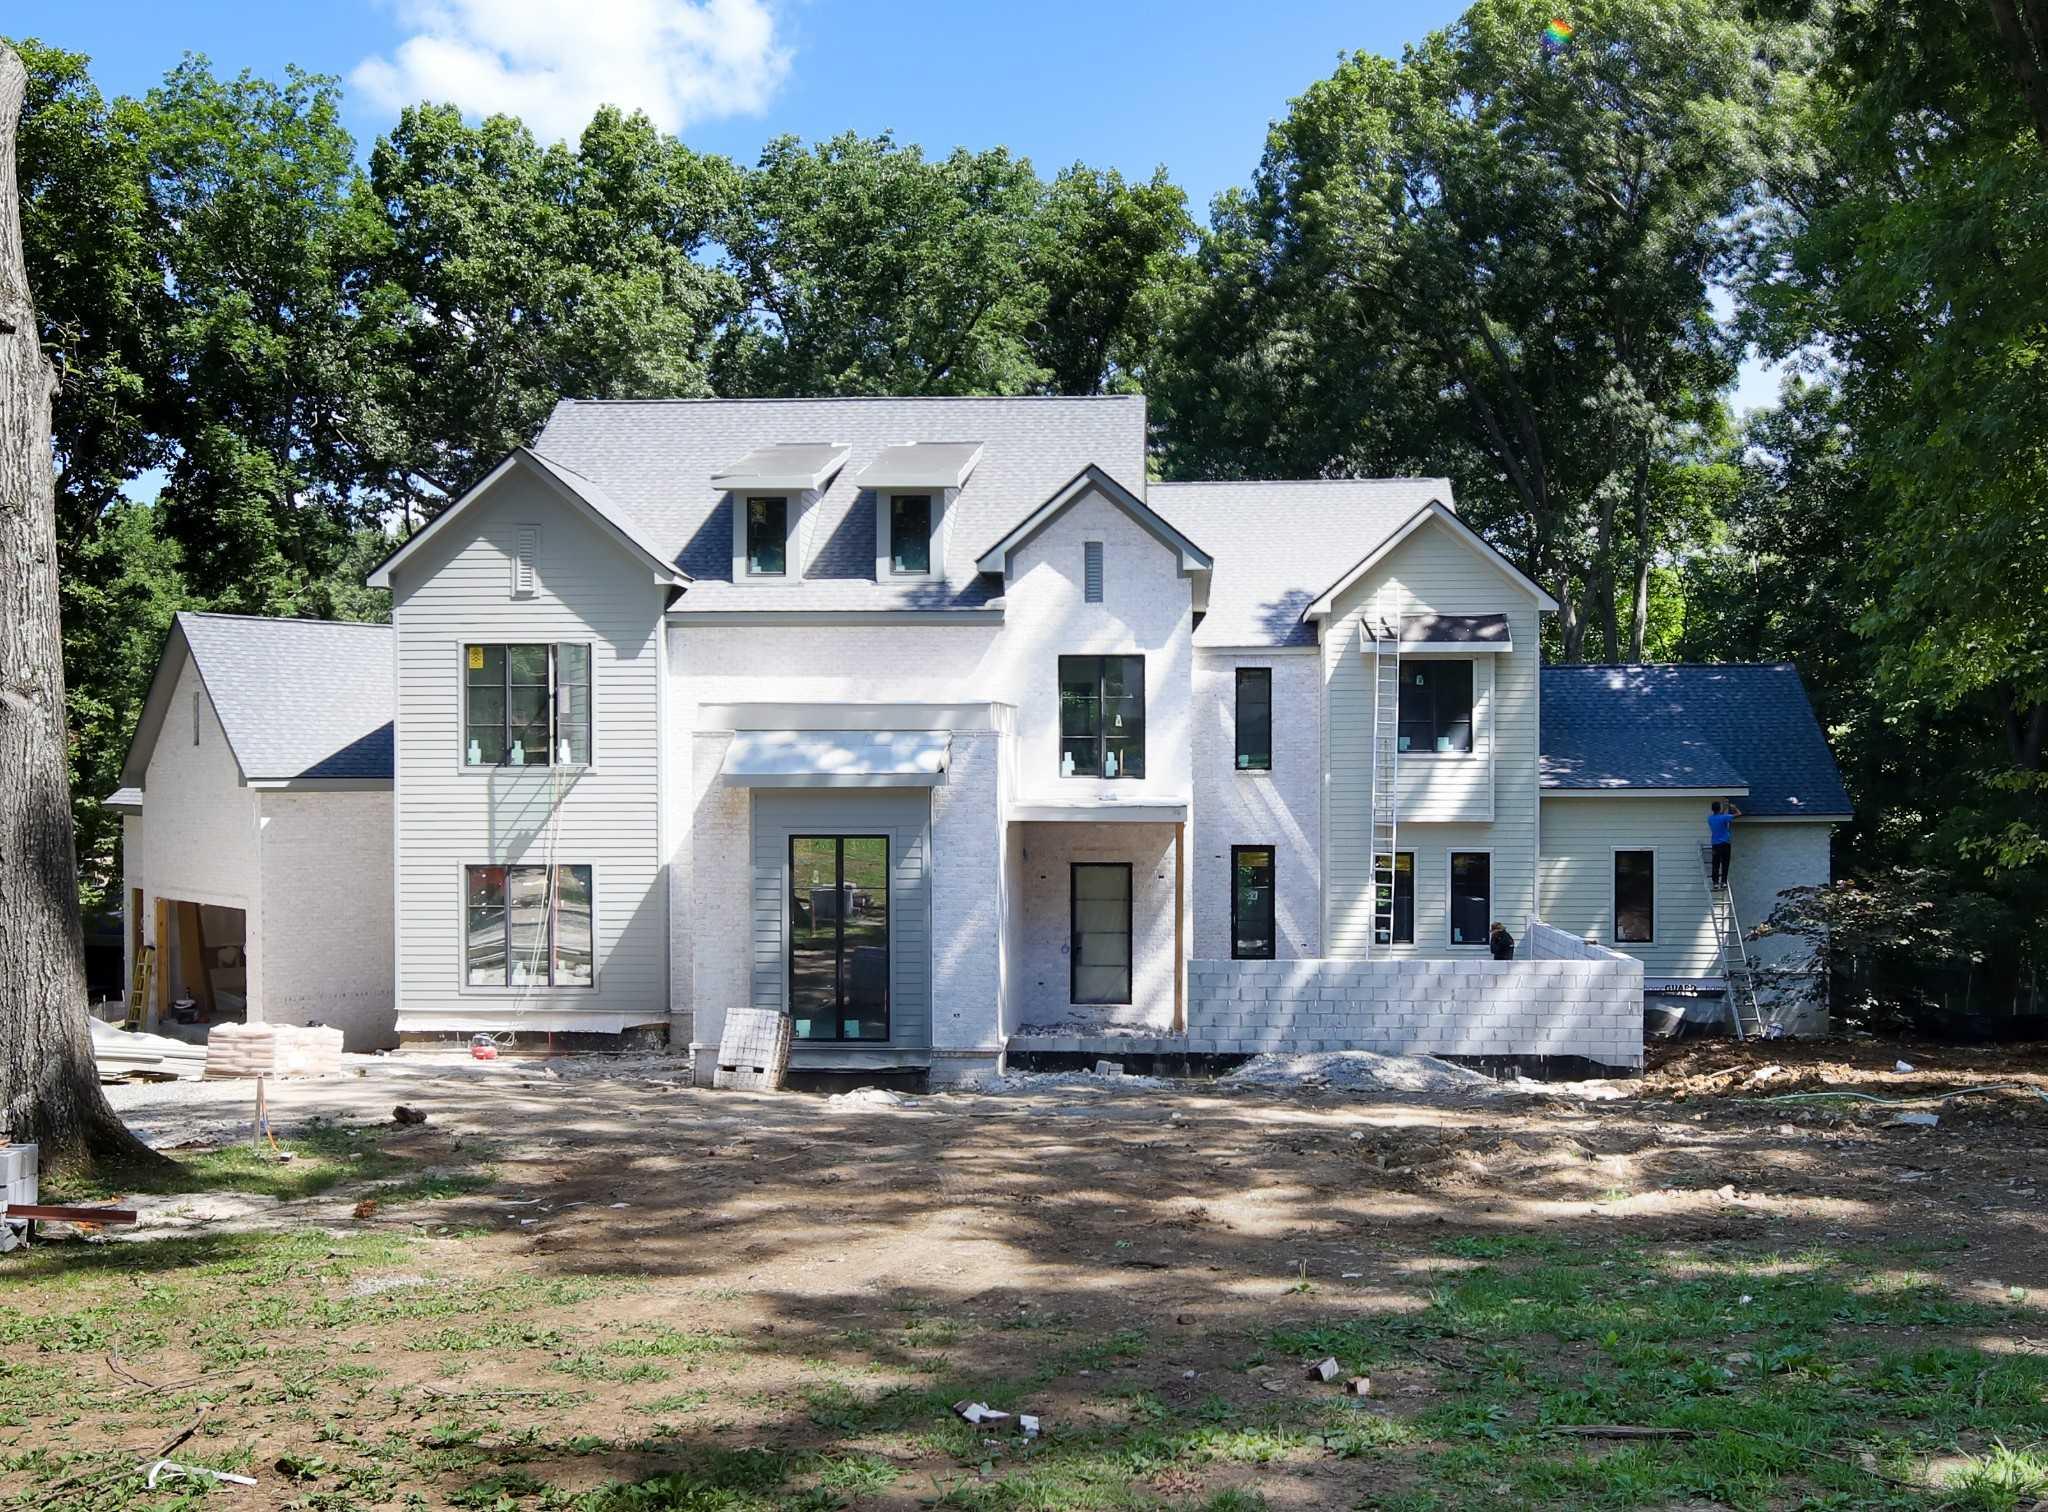 $3,749,999 - 5Br/7Ba -  for Sale in West Meade Farms, Nashville